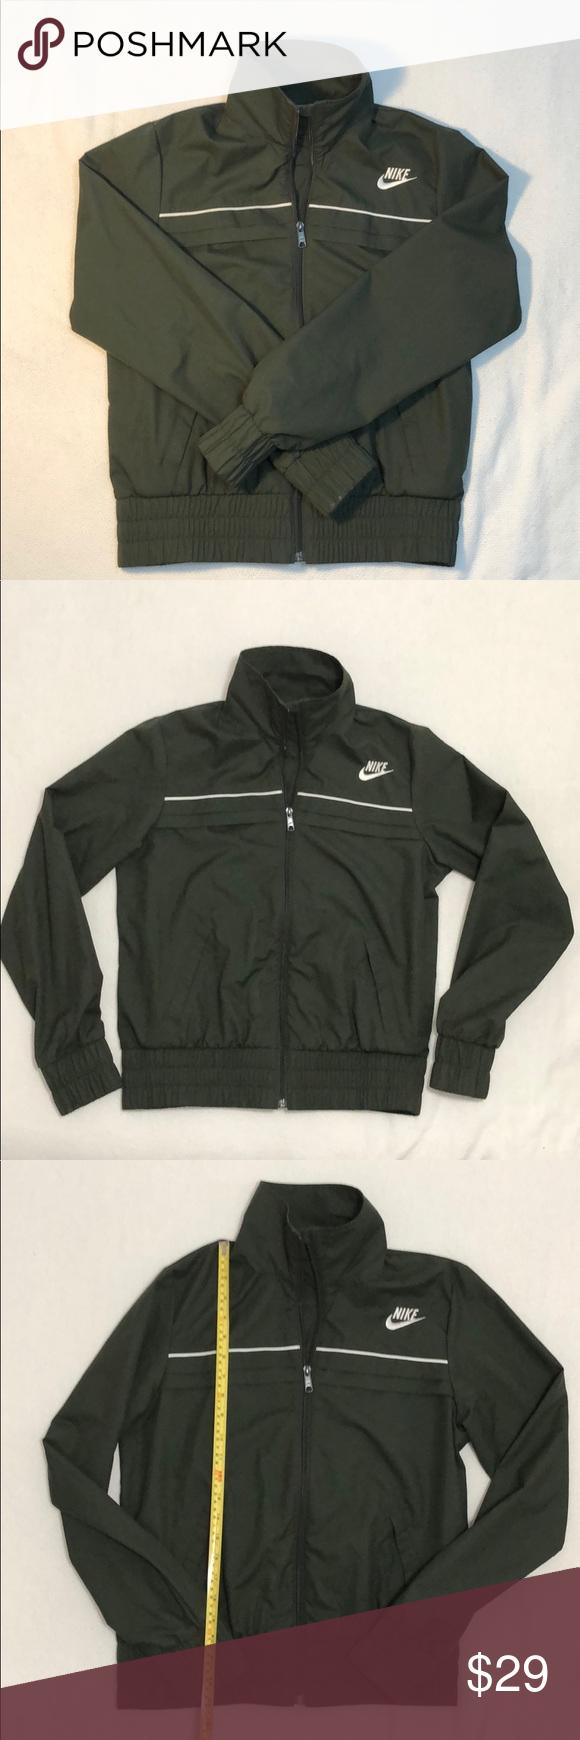 4bf3643ed9b7 Nike hunter green lightweight bomber jacket Perfect for Spring! Super cute  Nike lightweight zip up